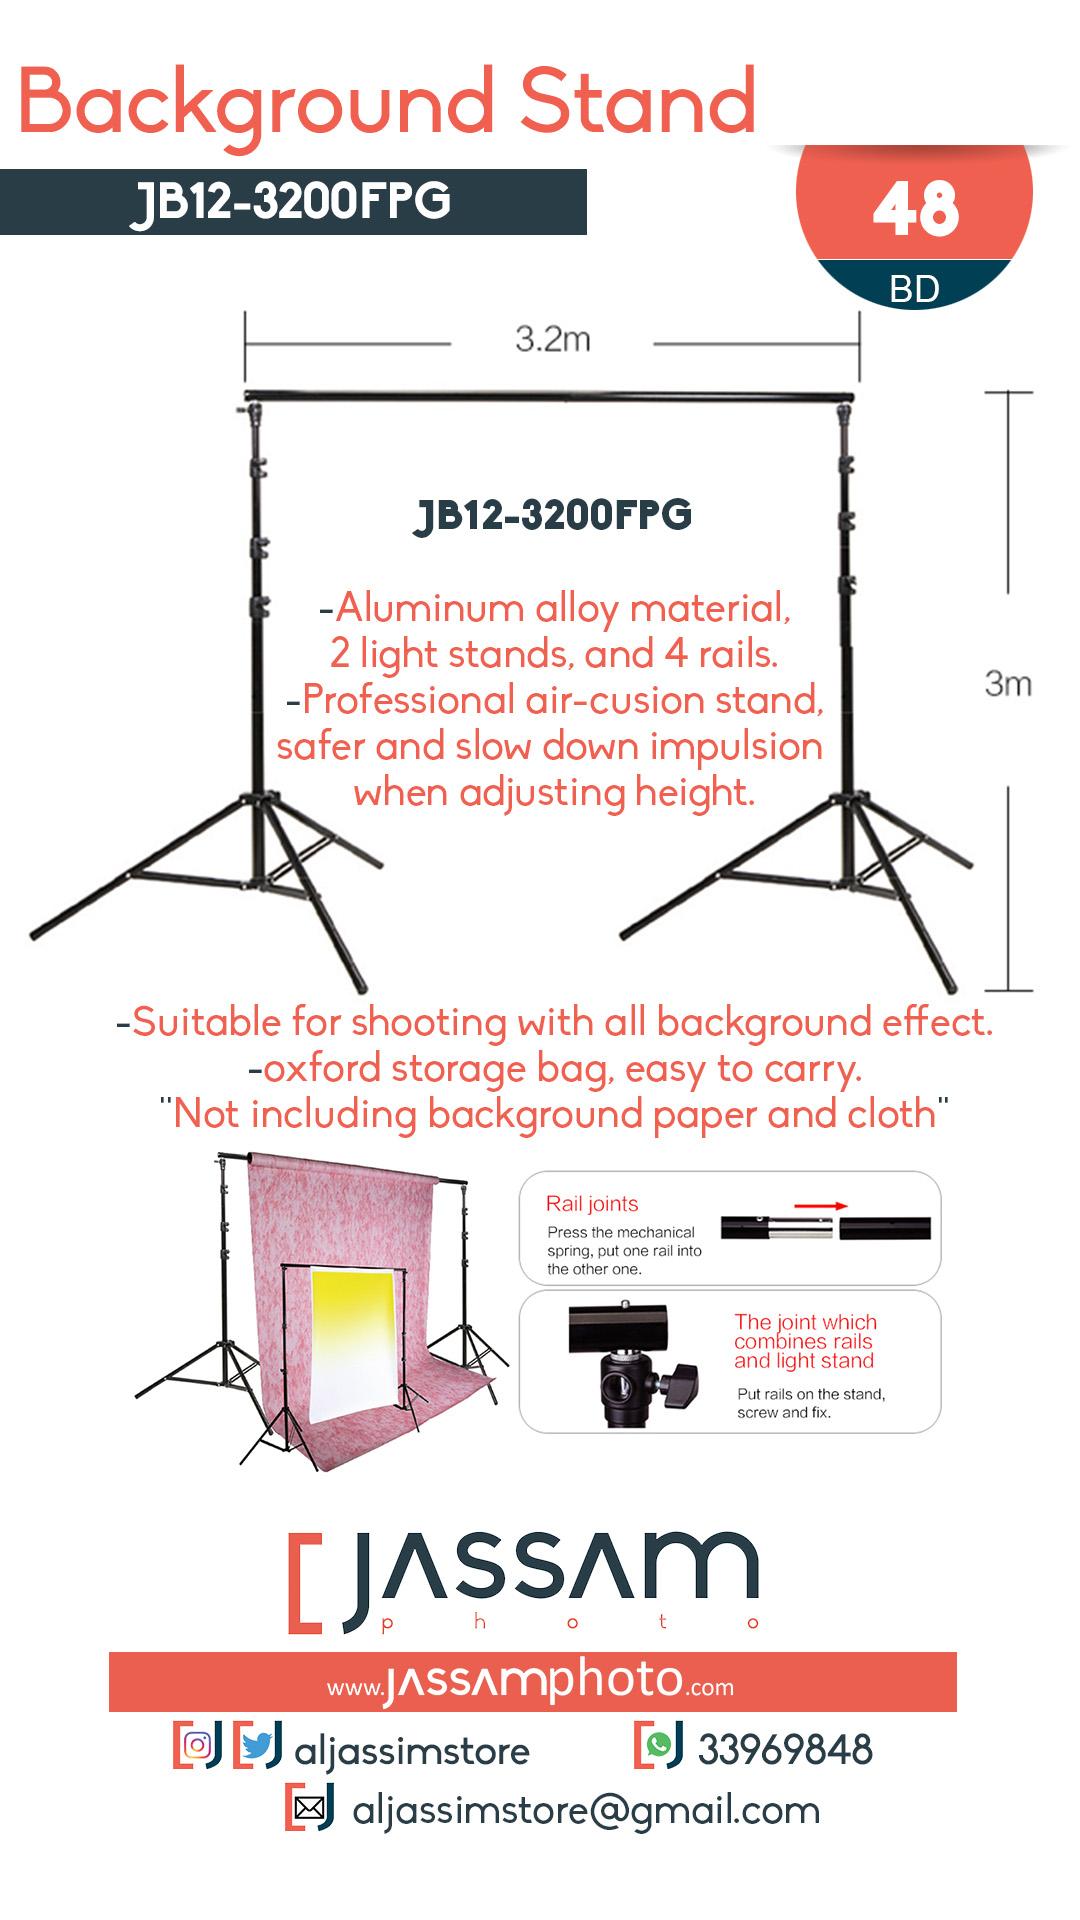 JB12-3200FBG Background Stand